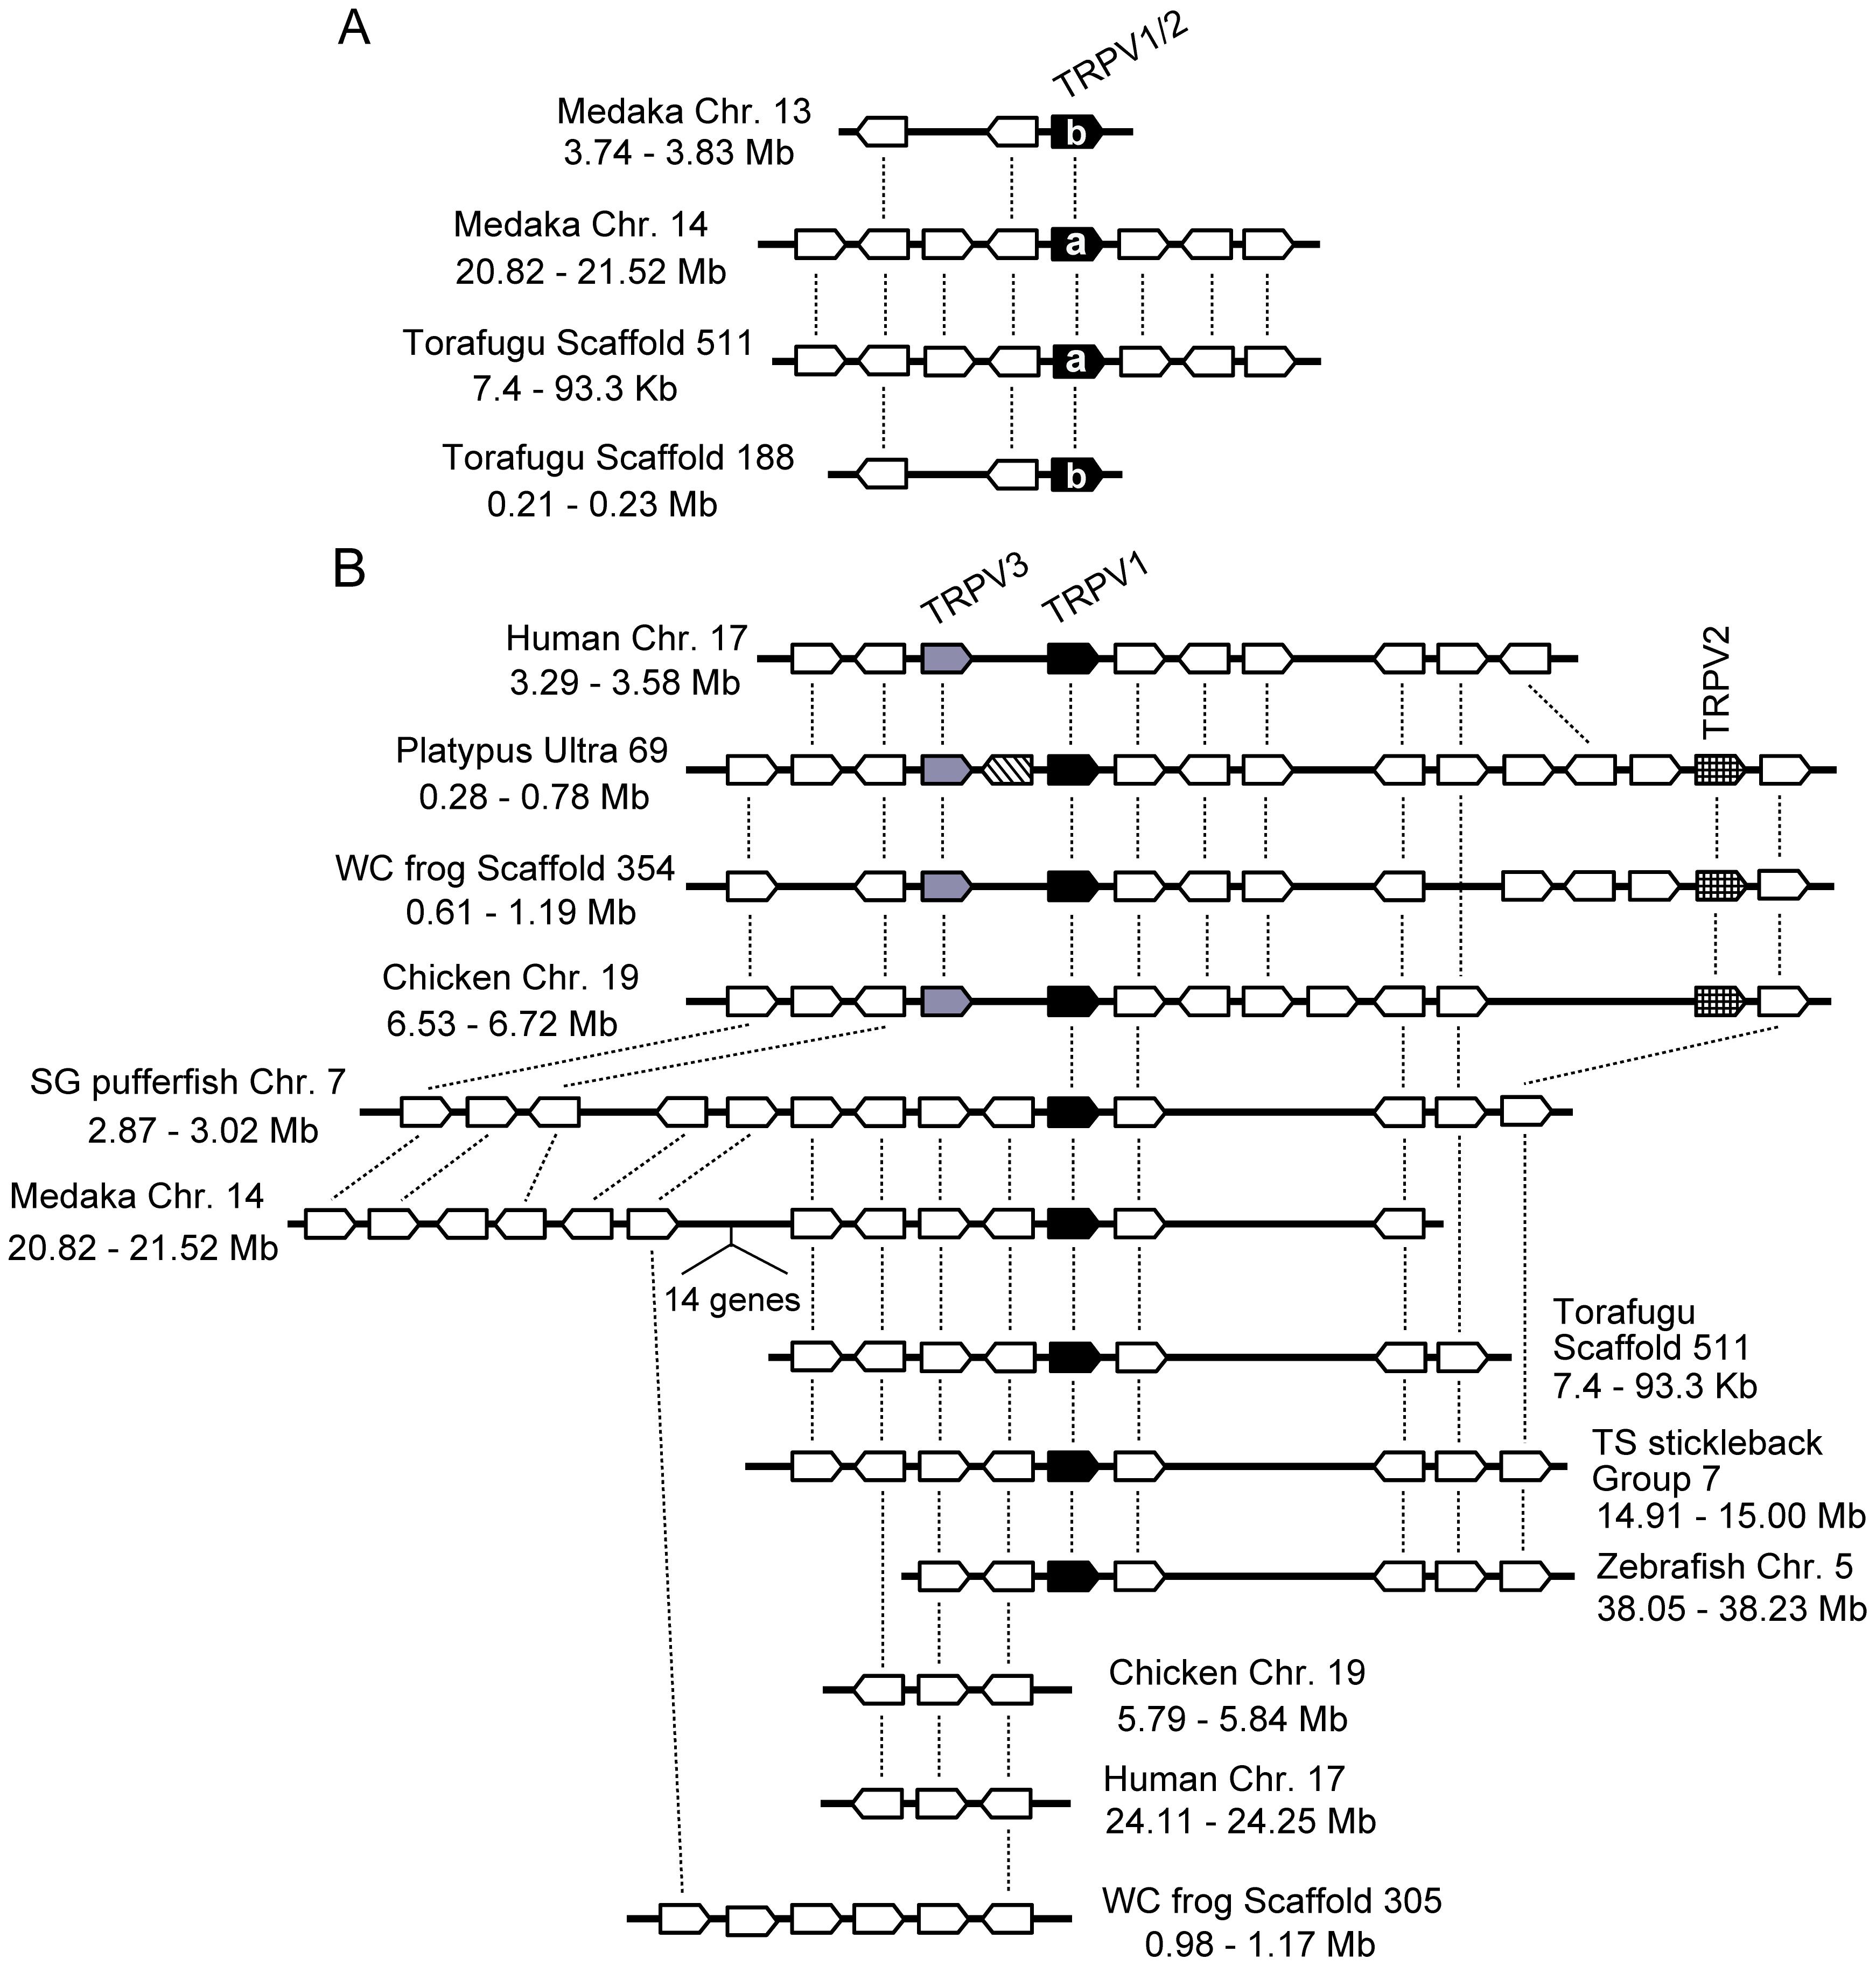 Conserved gene arrangements in the genomic regions encompassing vertebrate <i>TRPV1-TRPV3</i> genes.